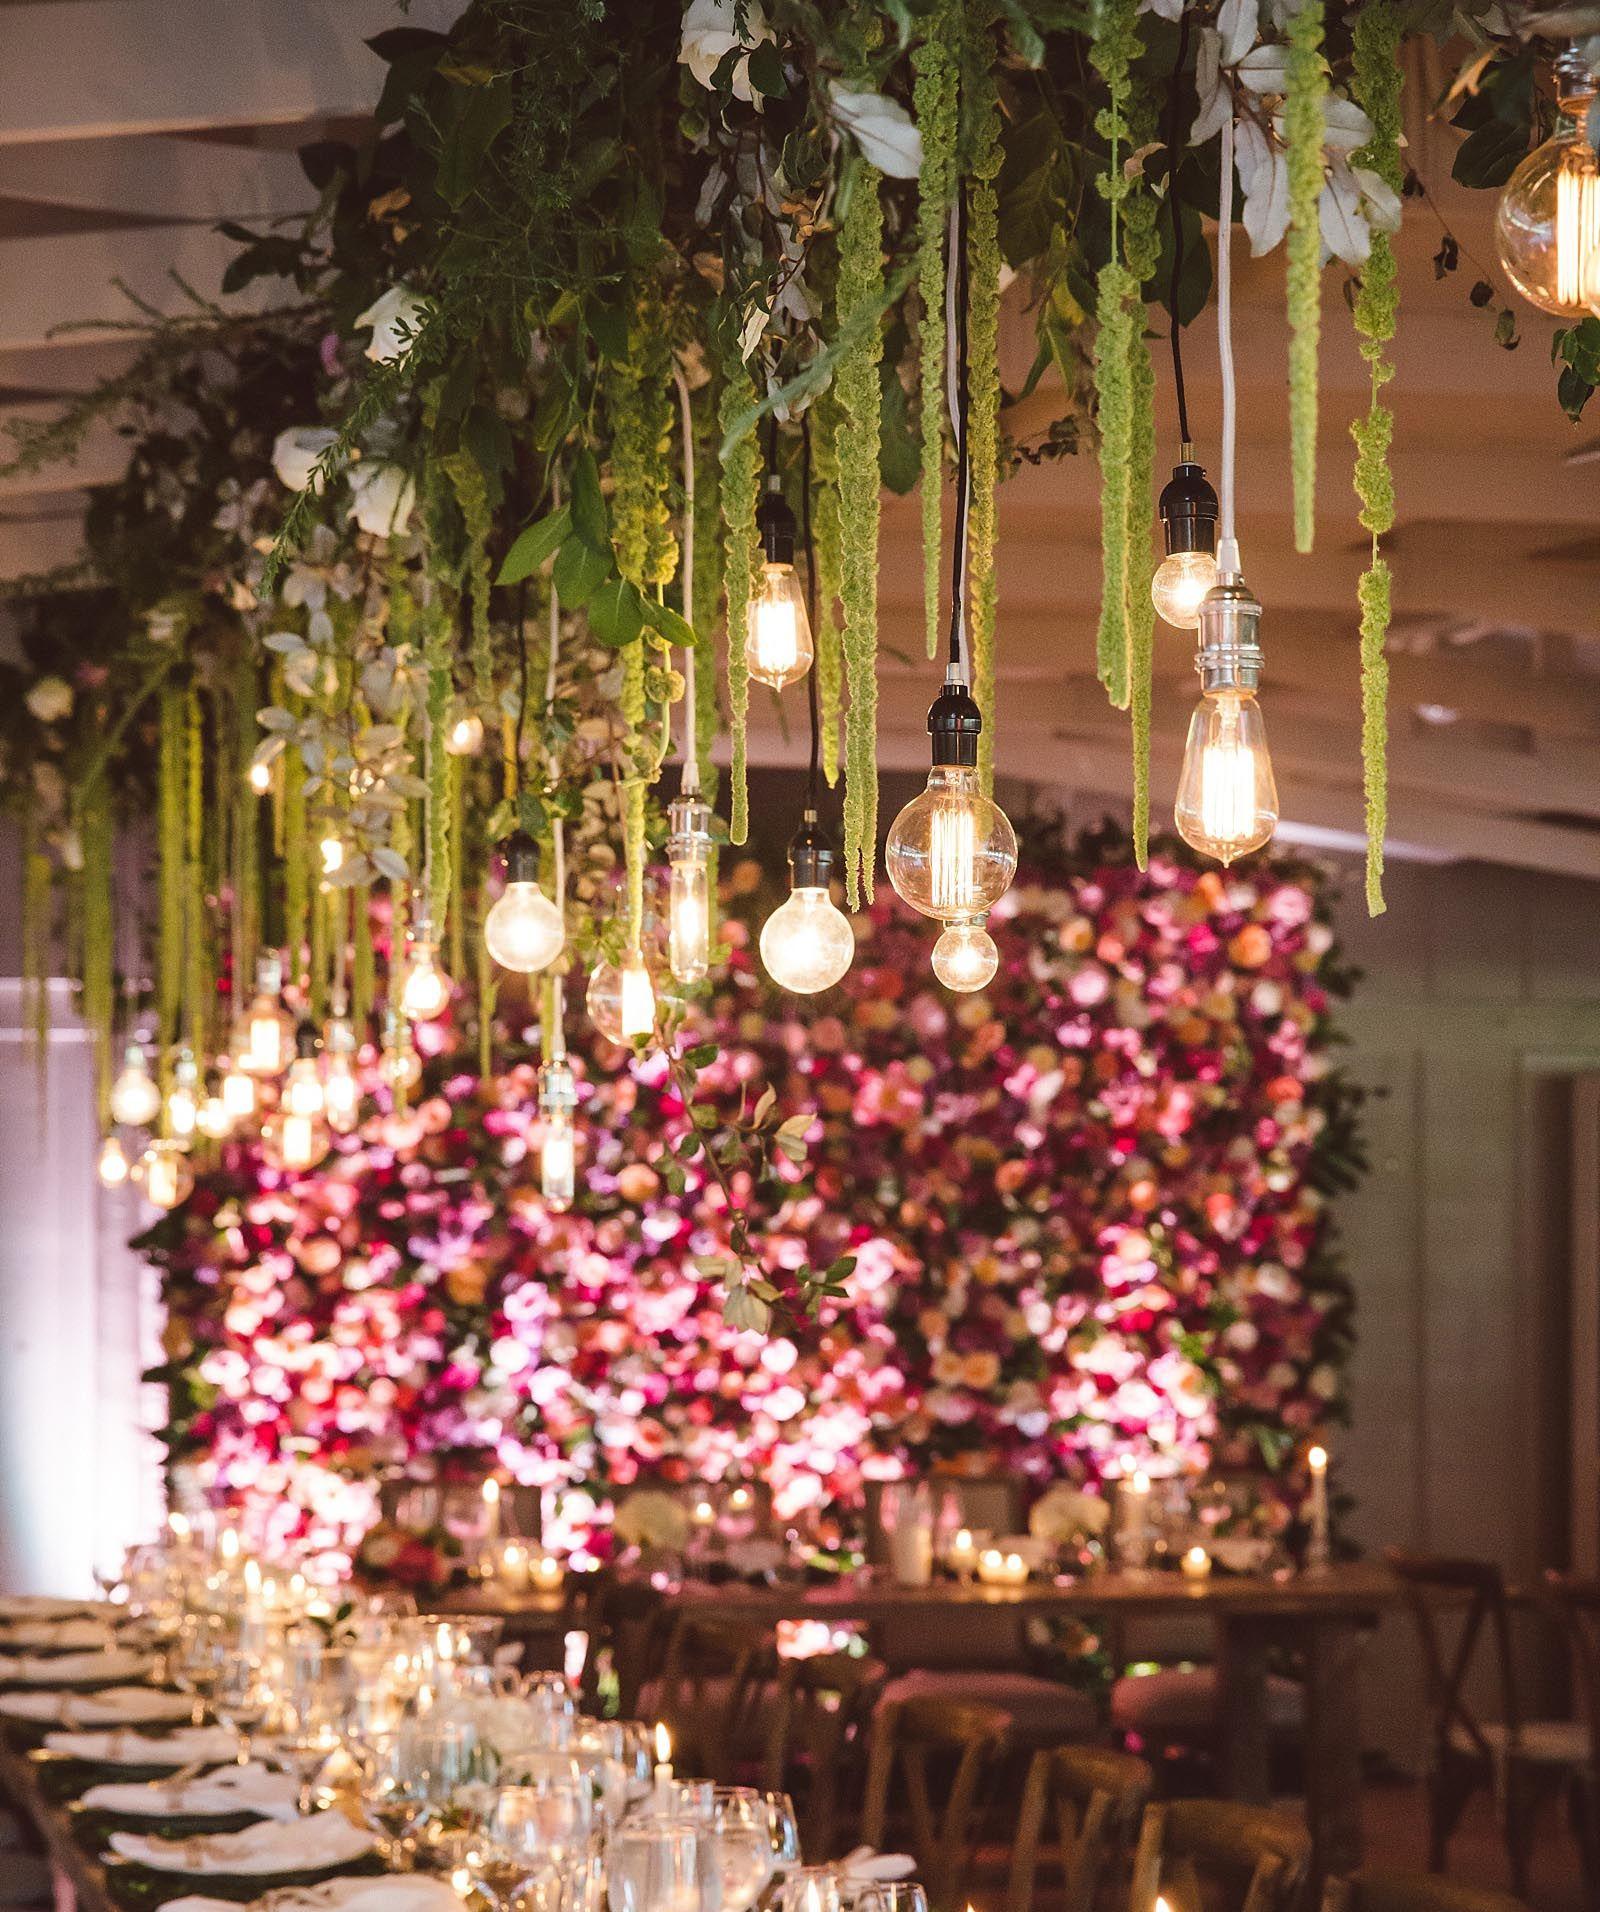 Stylish Wedding Ceremony Decor: Pin By Vicki Pugh On Wedding Decorations (With Images